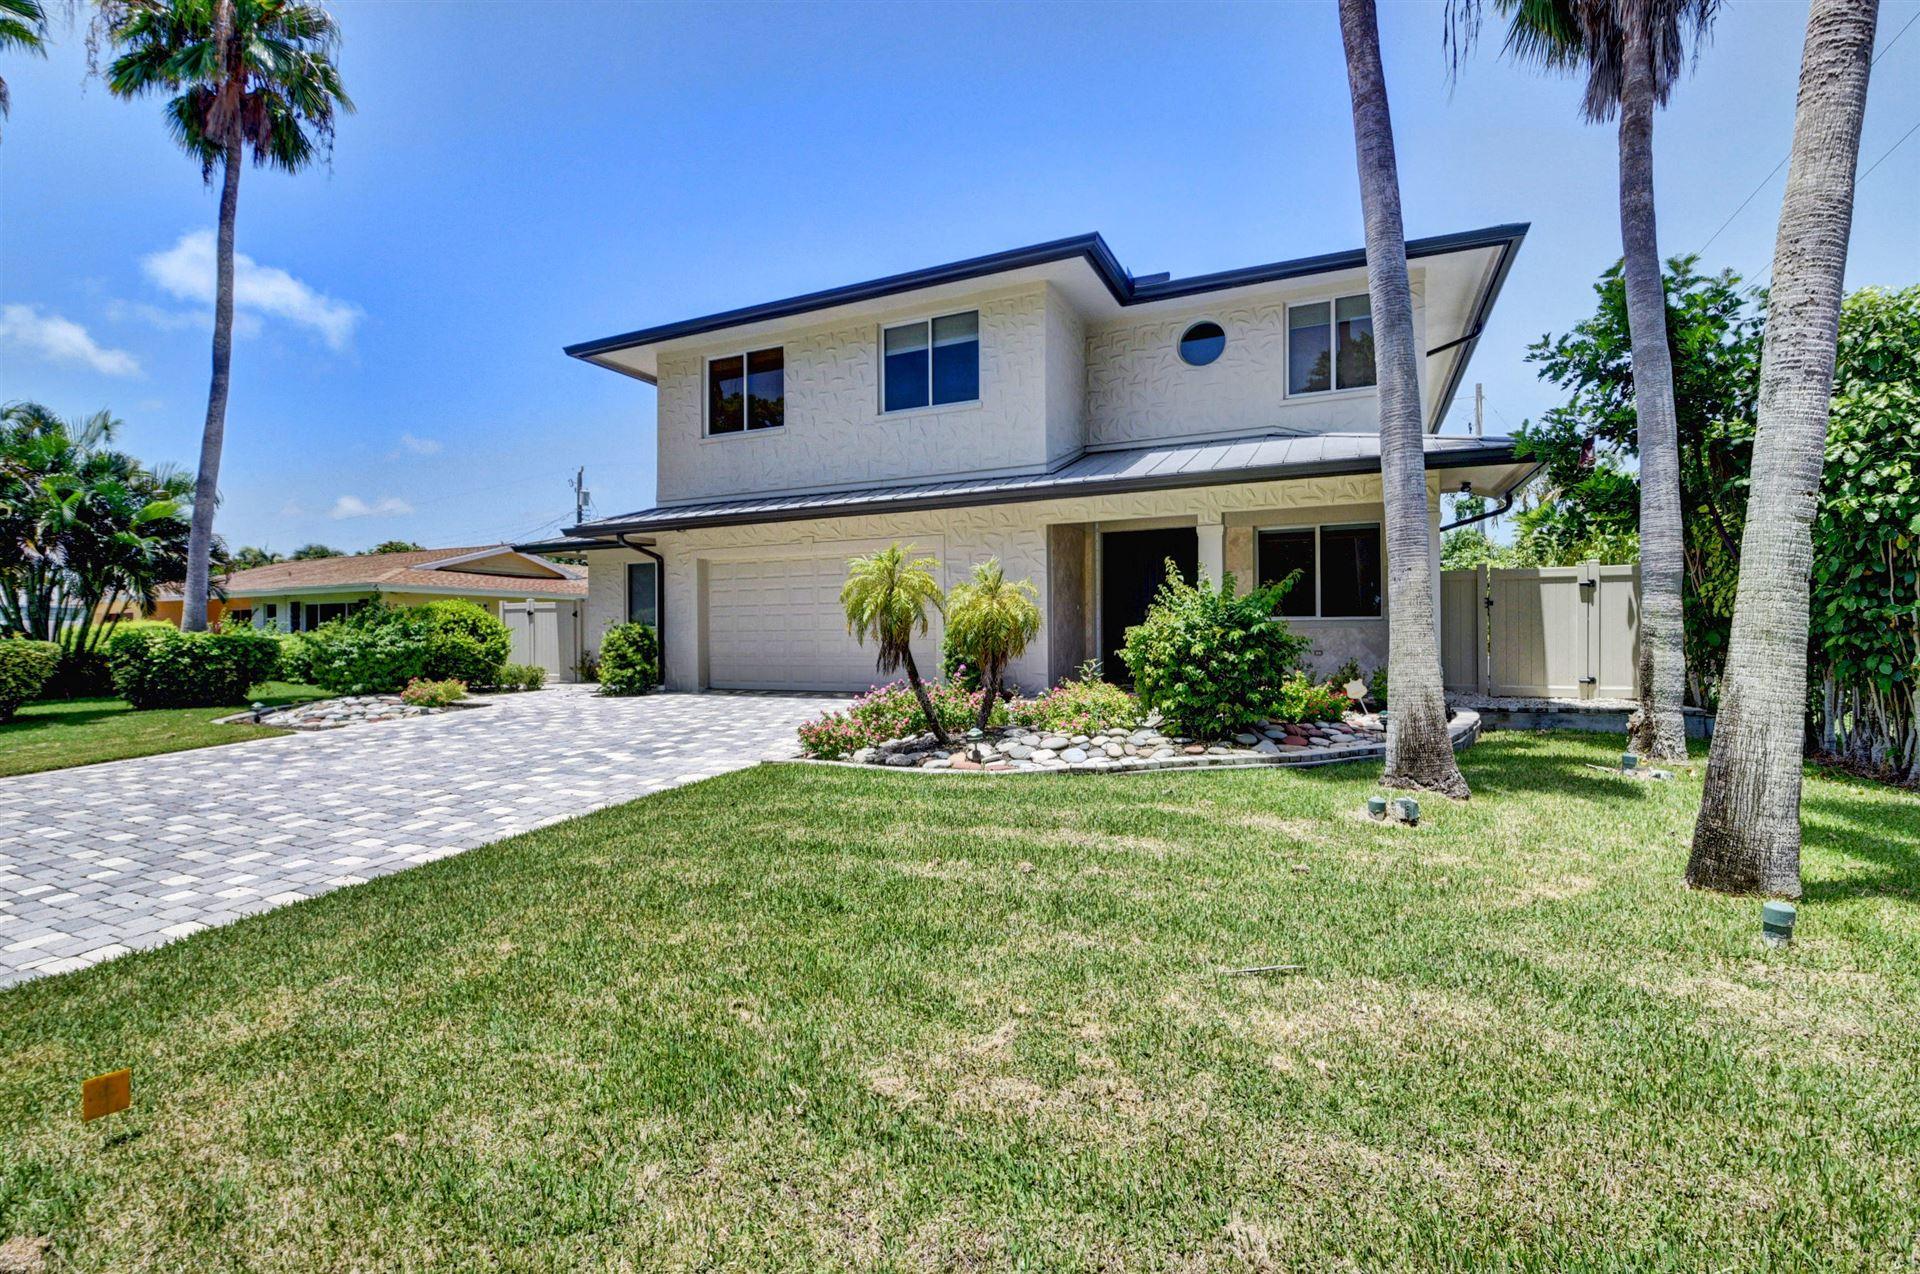 541 NE 16th Street, Boca Raton, FL 33432 - #: RX-10630533